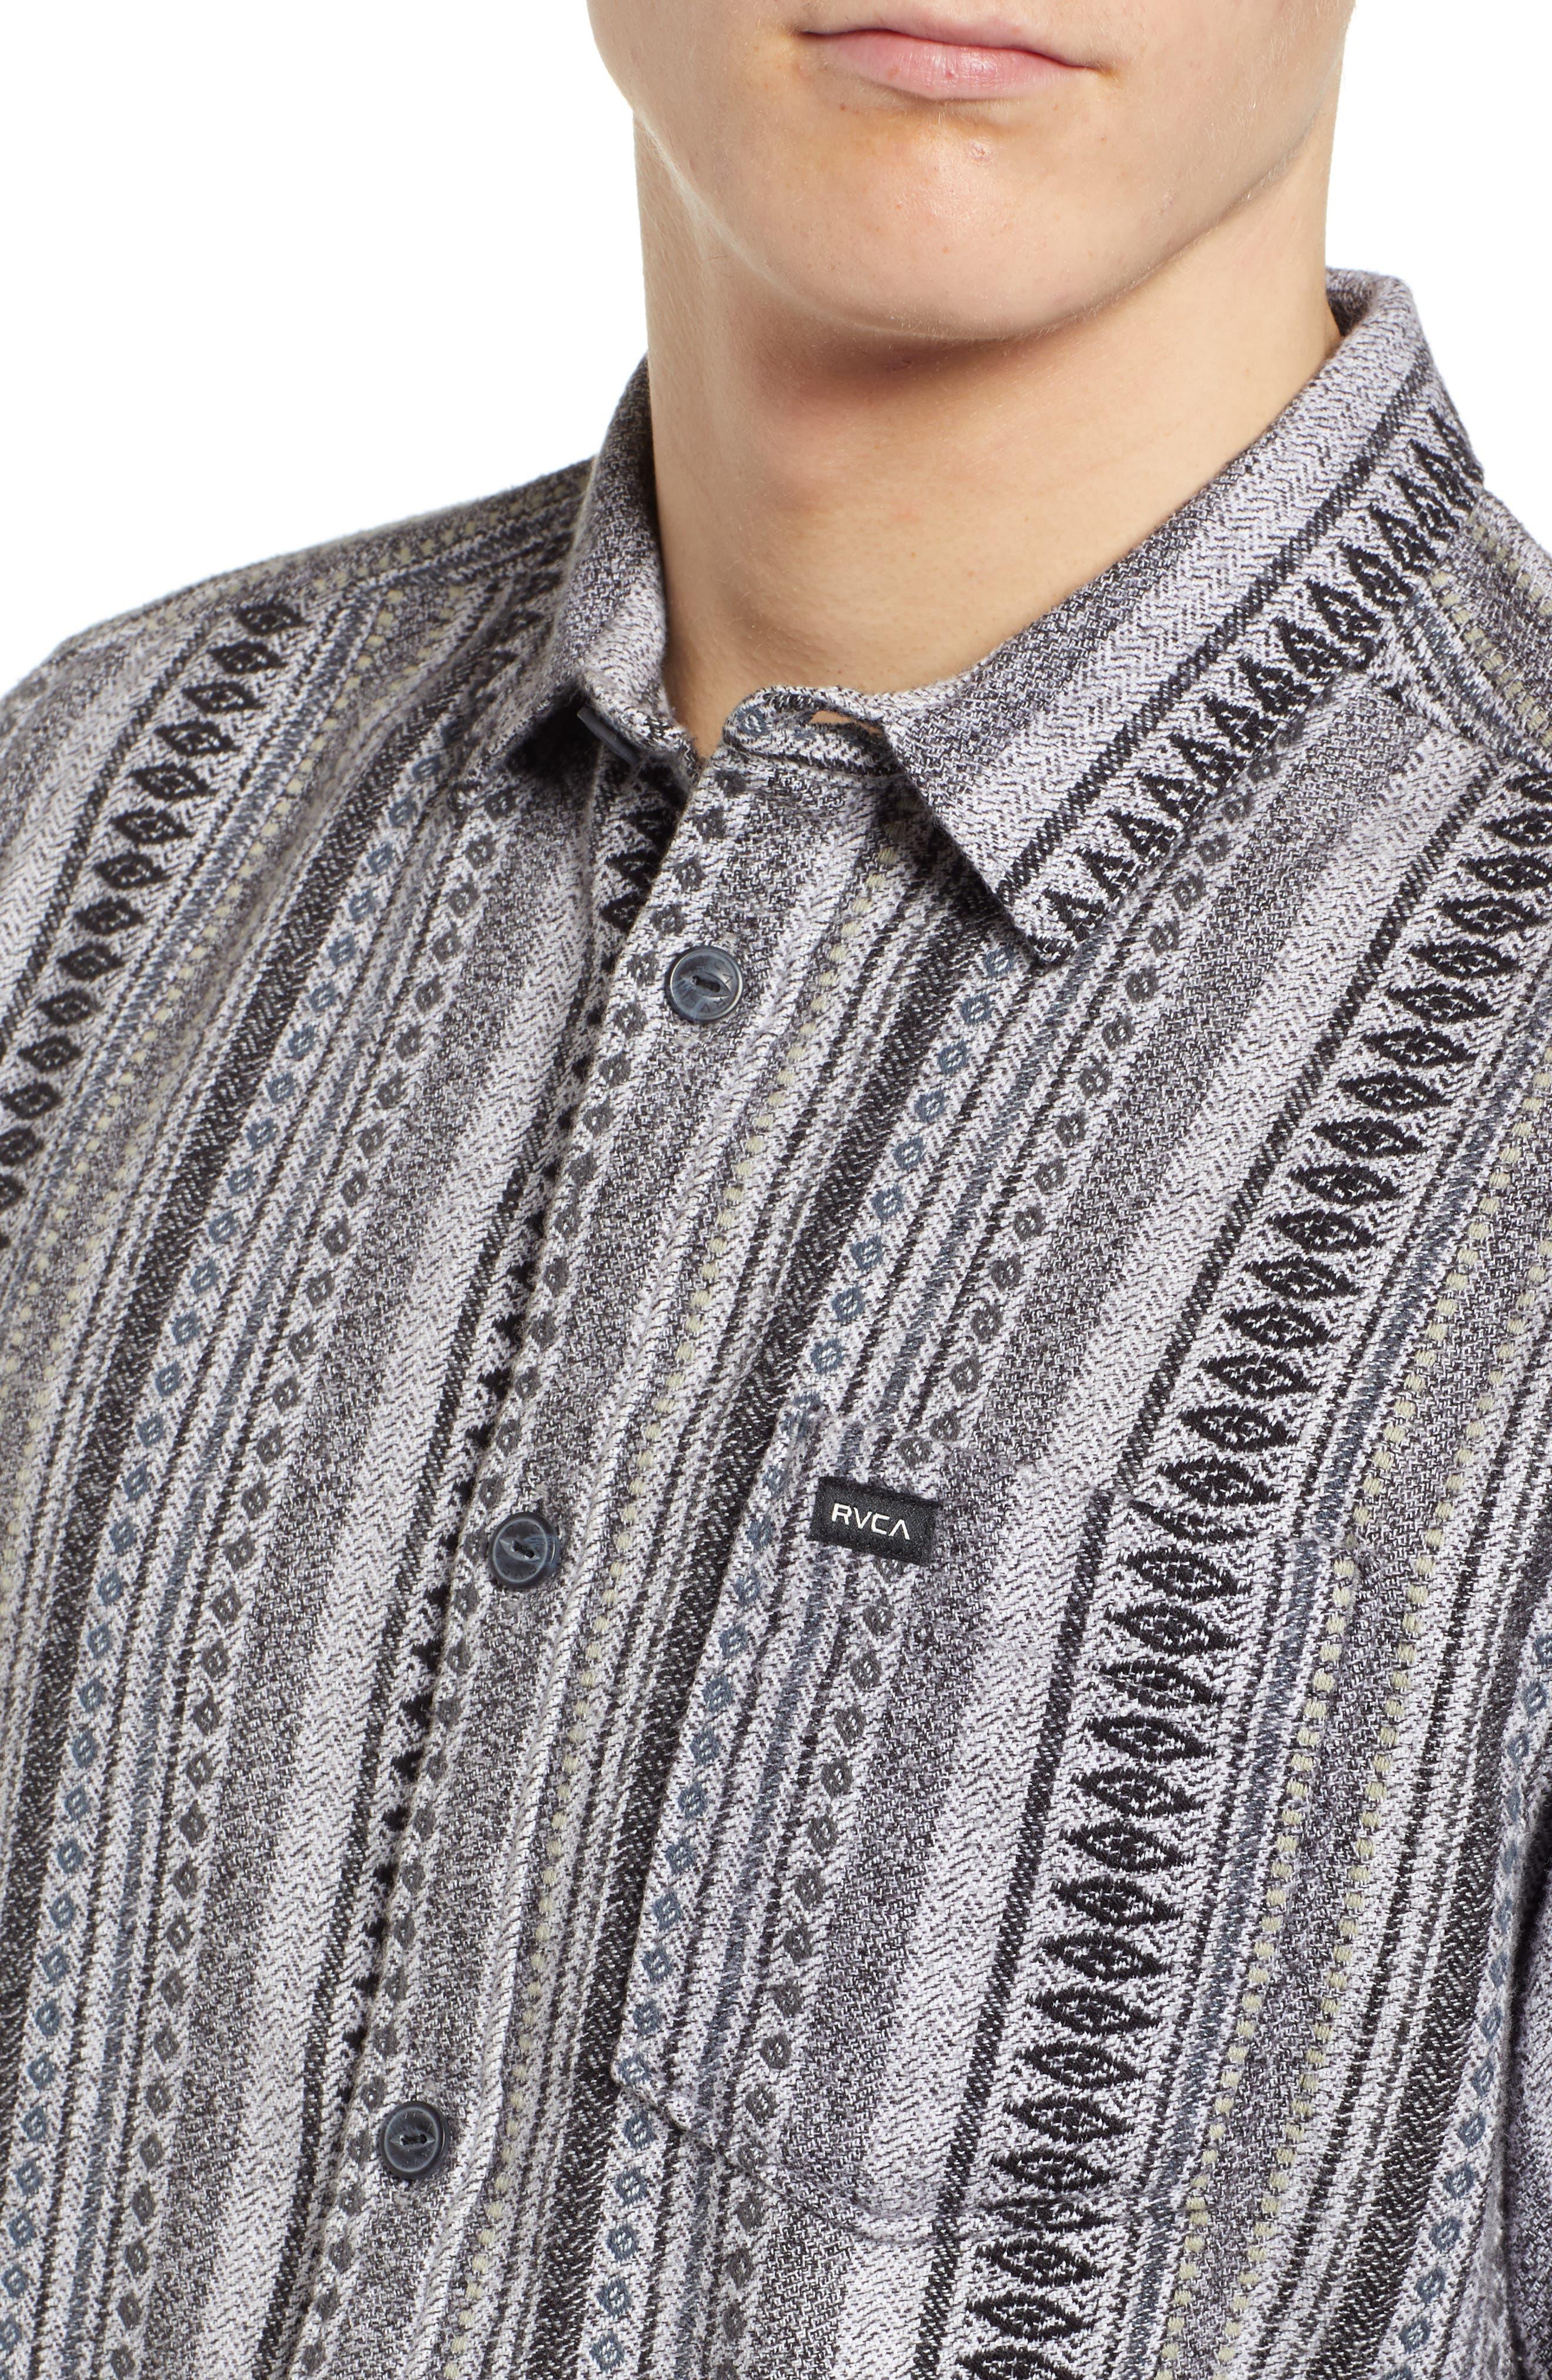 RVCA, Small Victory Woven Shirt, Alternate thumbnail 2, color, SMOKEY GREY HEATHER